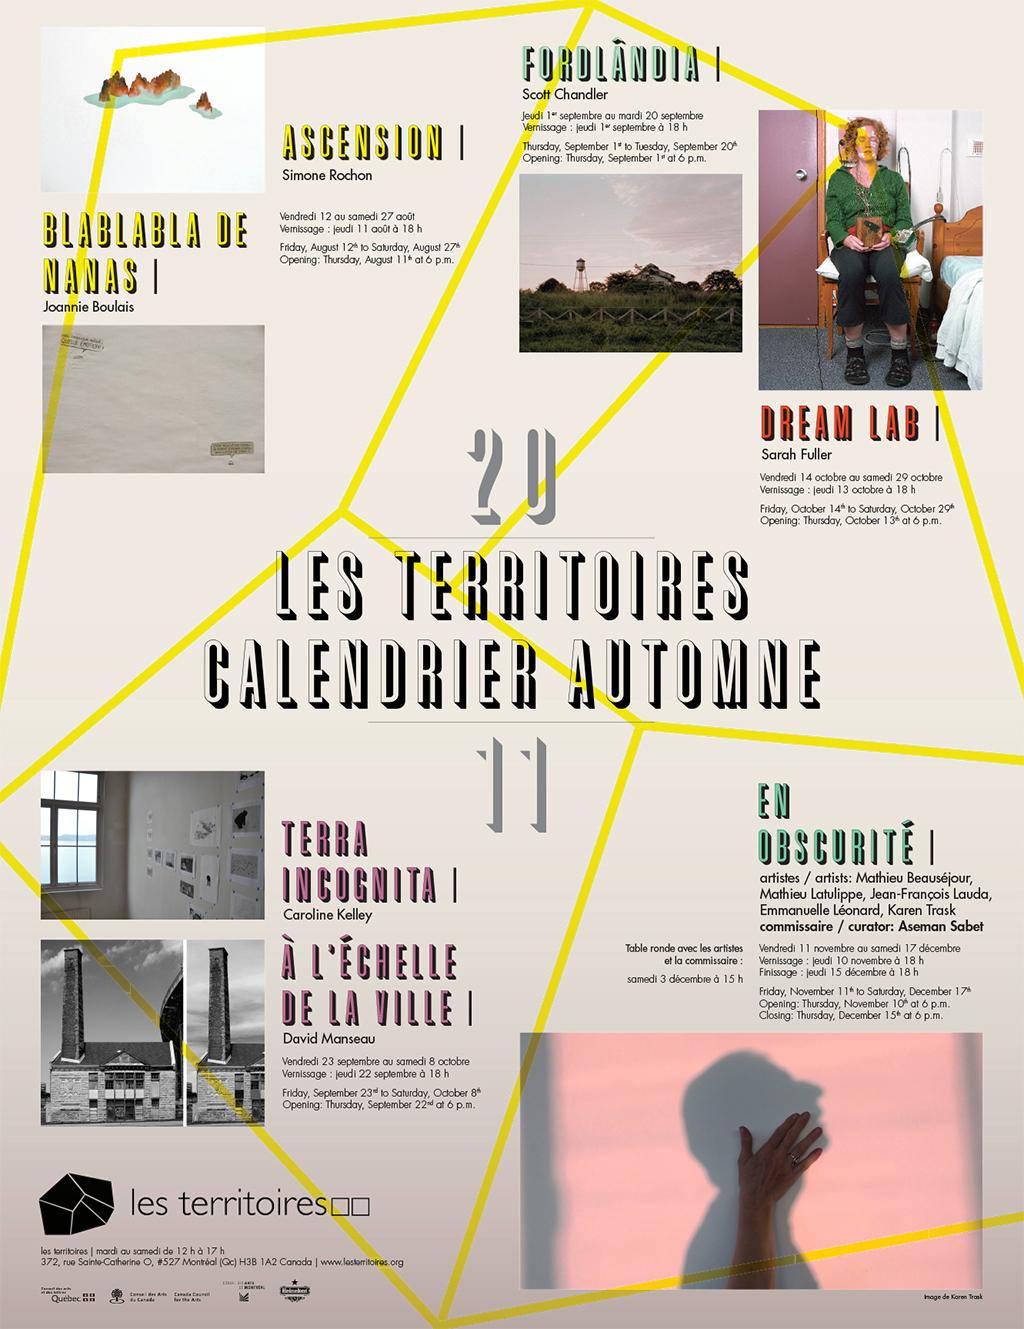 LesTerritoiresFall2011-1b-R2.indd